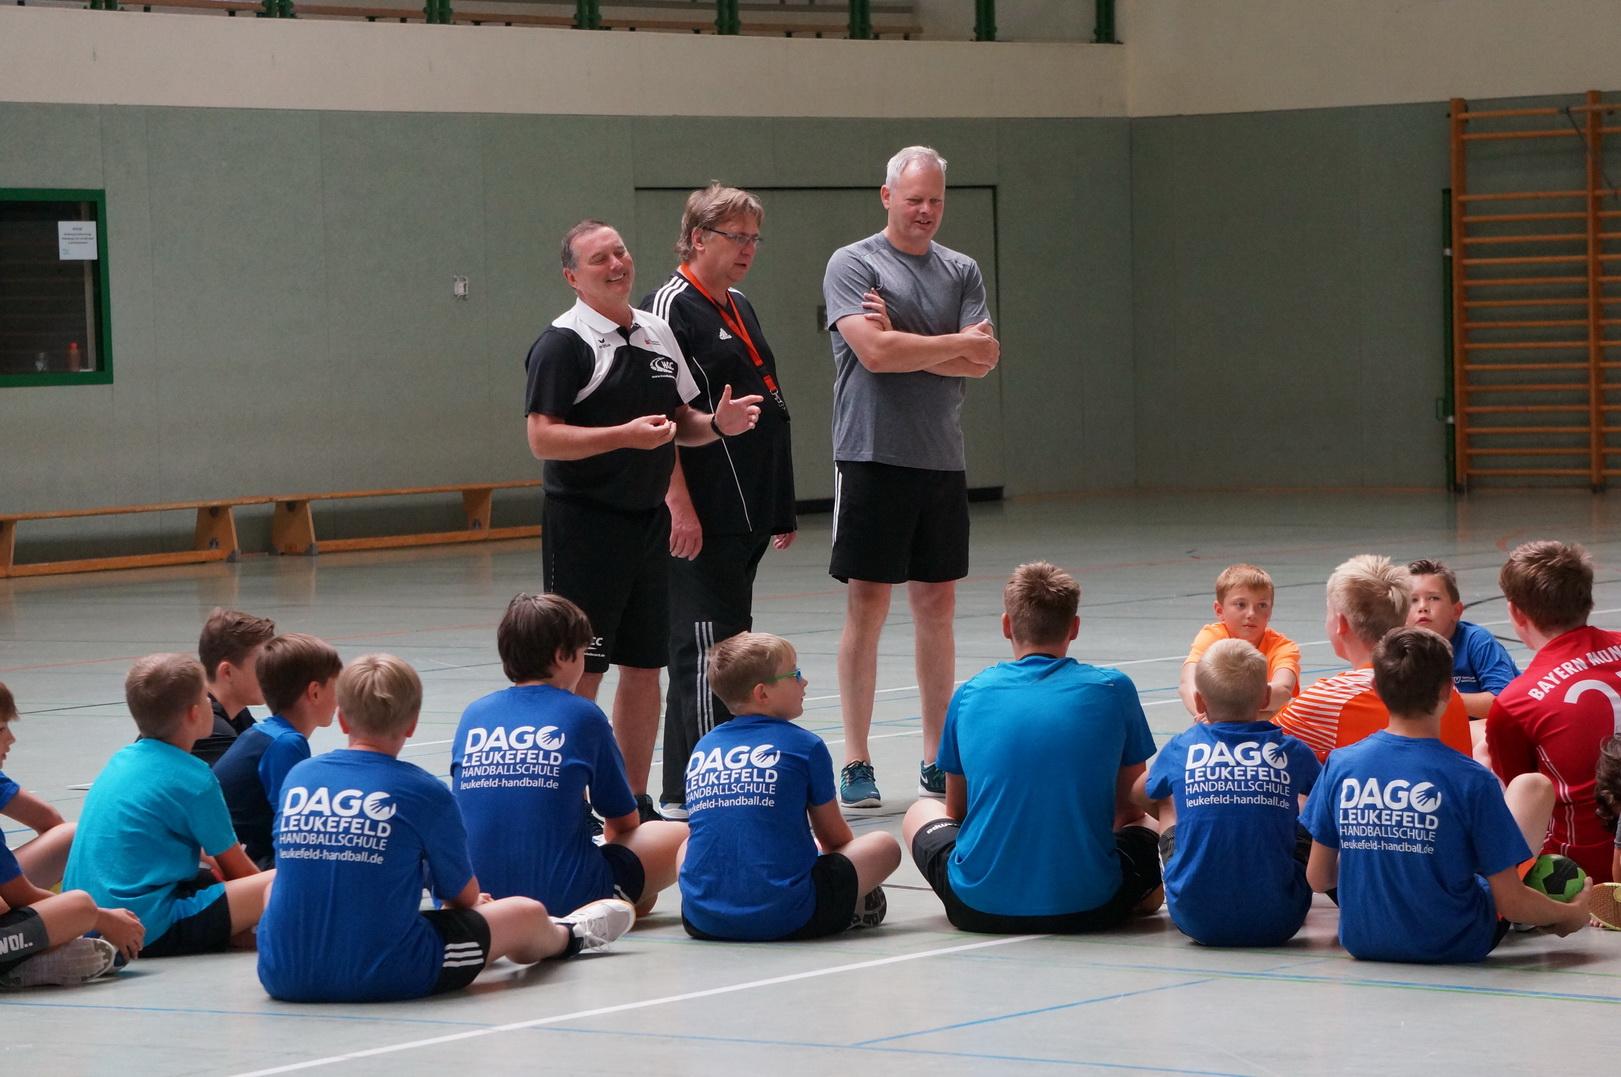 201808_Handballcamp_SDH_MG_141w